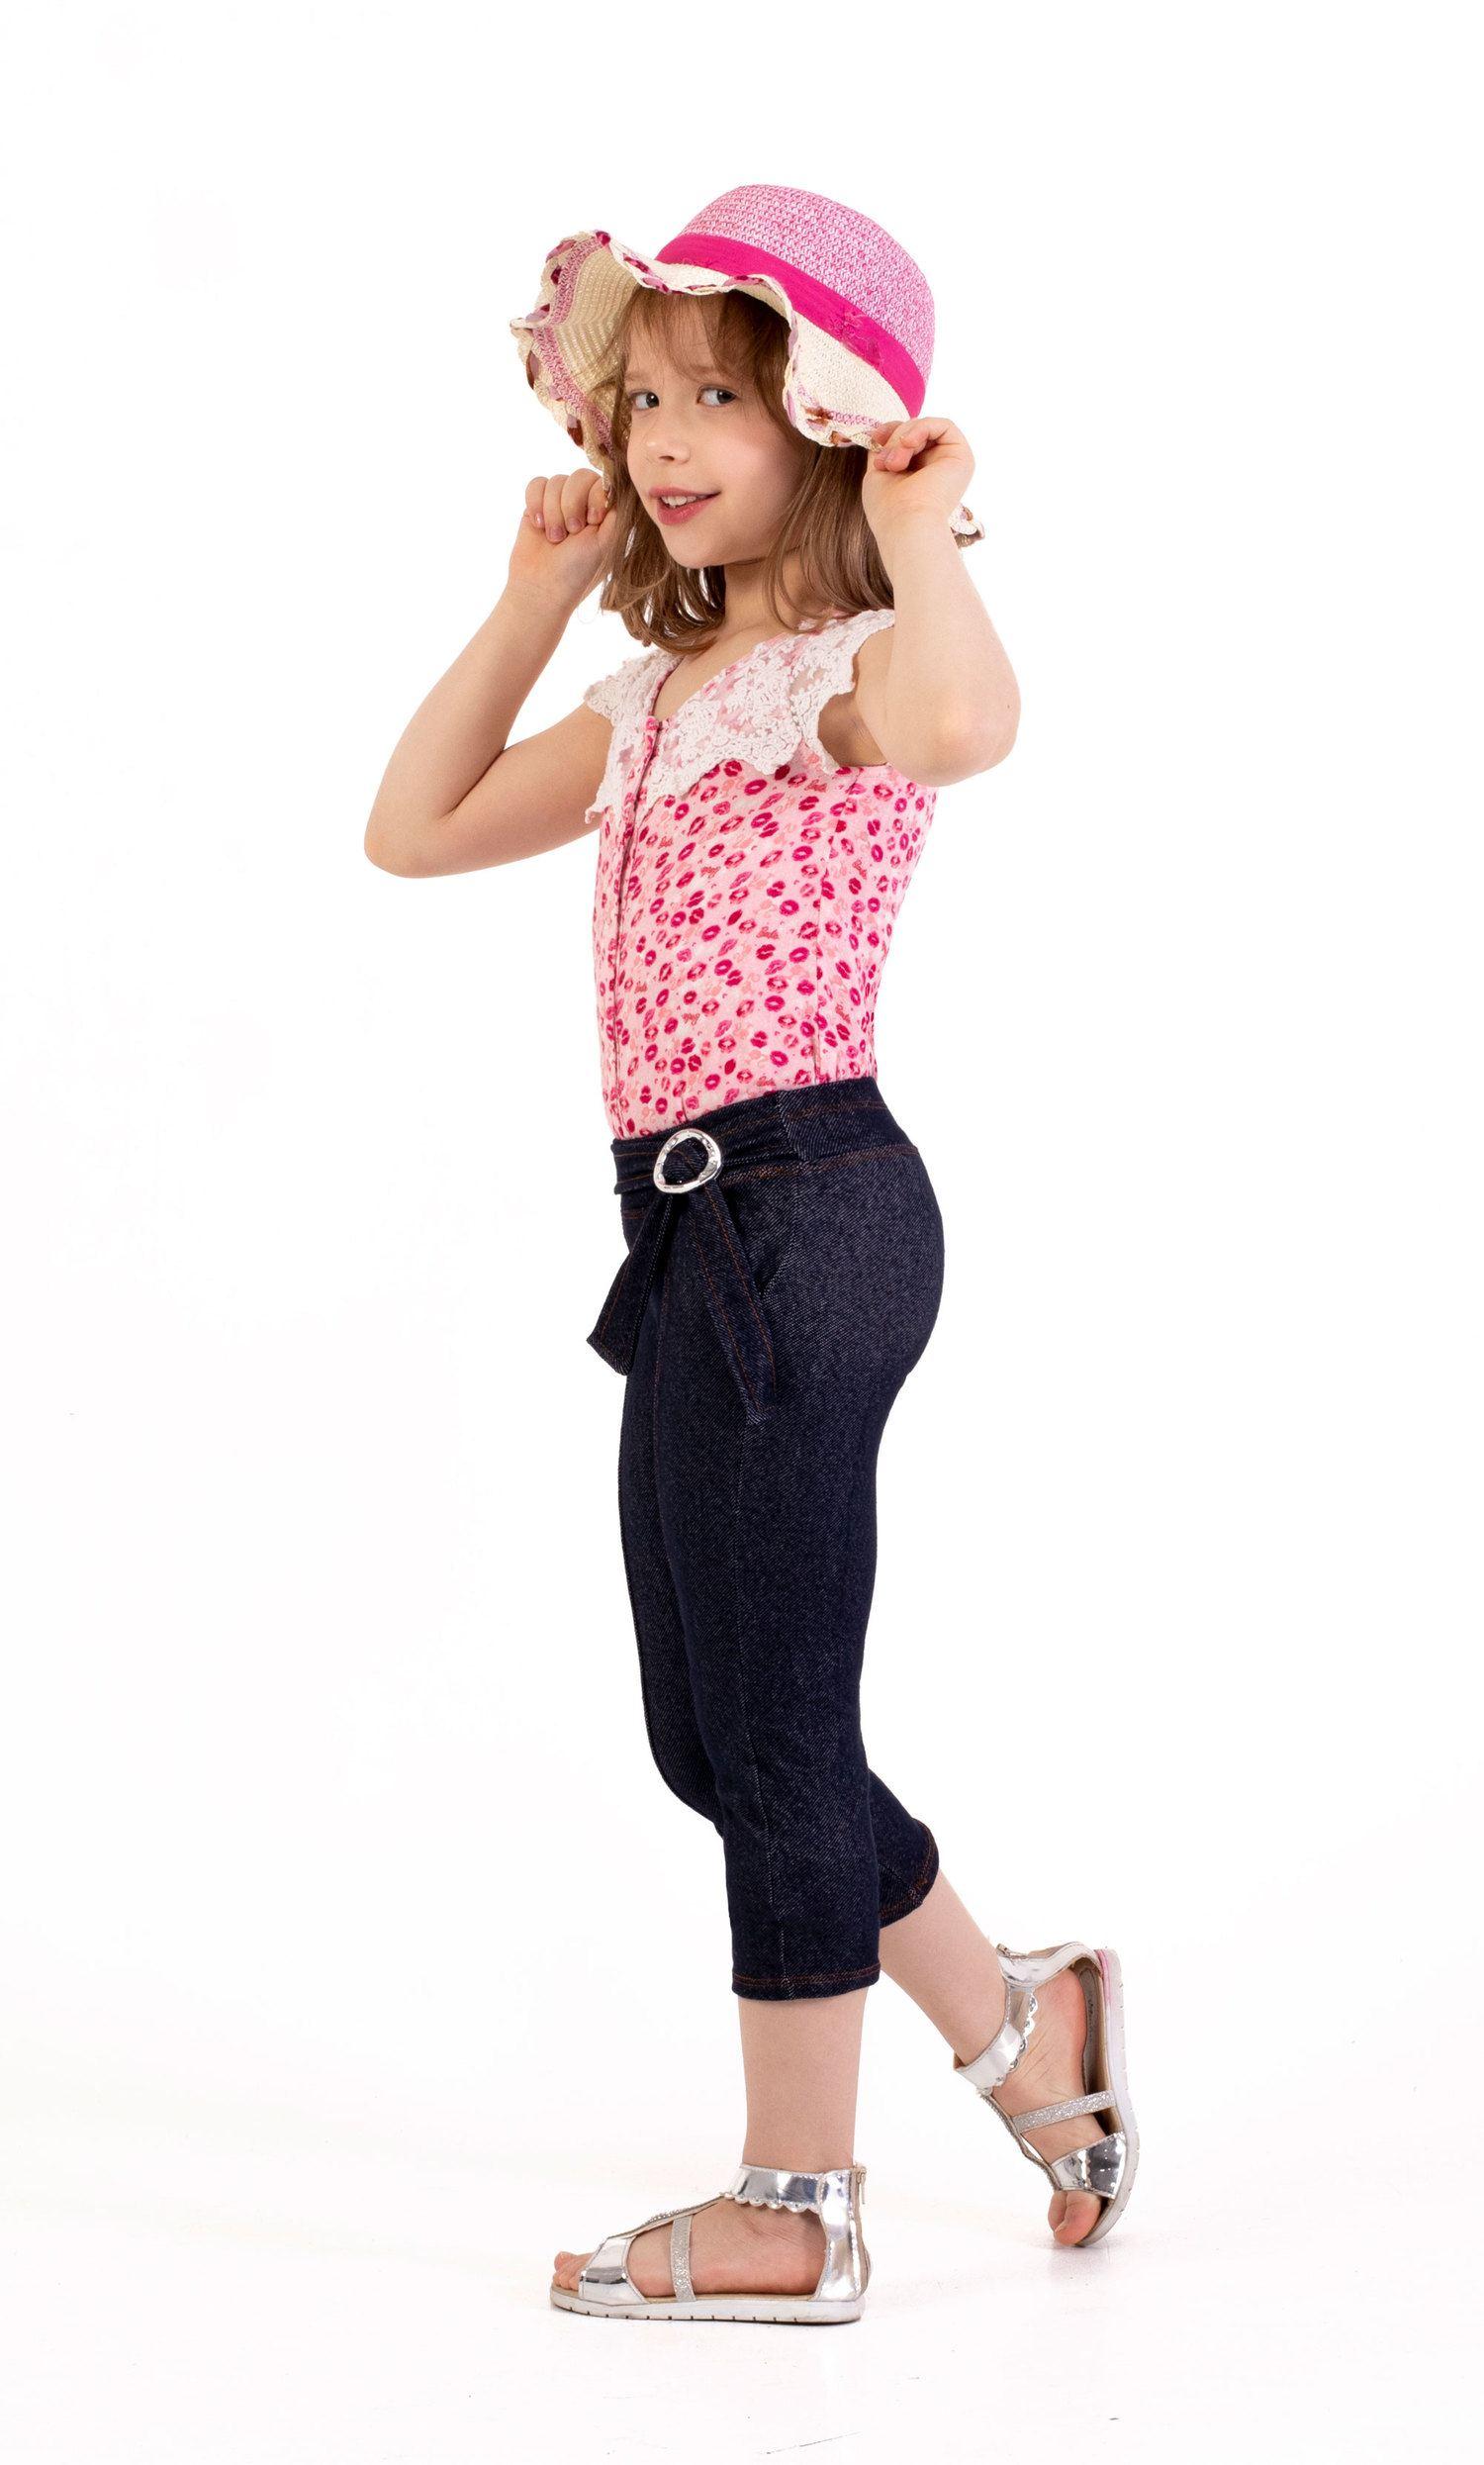 Capri Cotton Jeans OverKids  (Ref 101102)